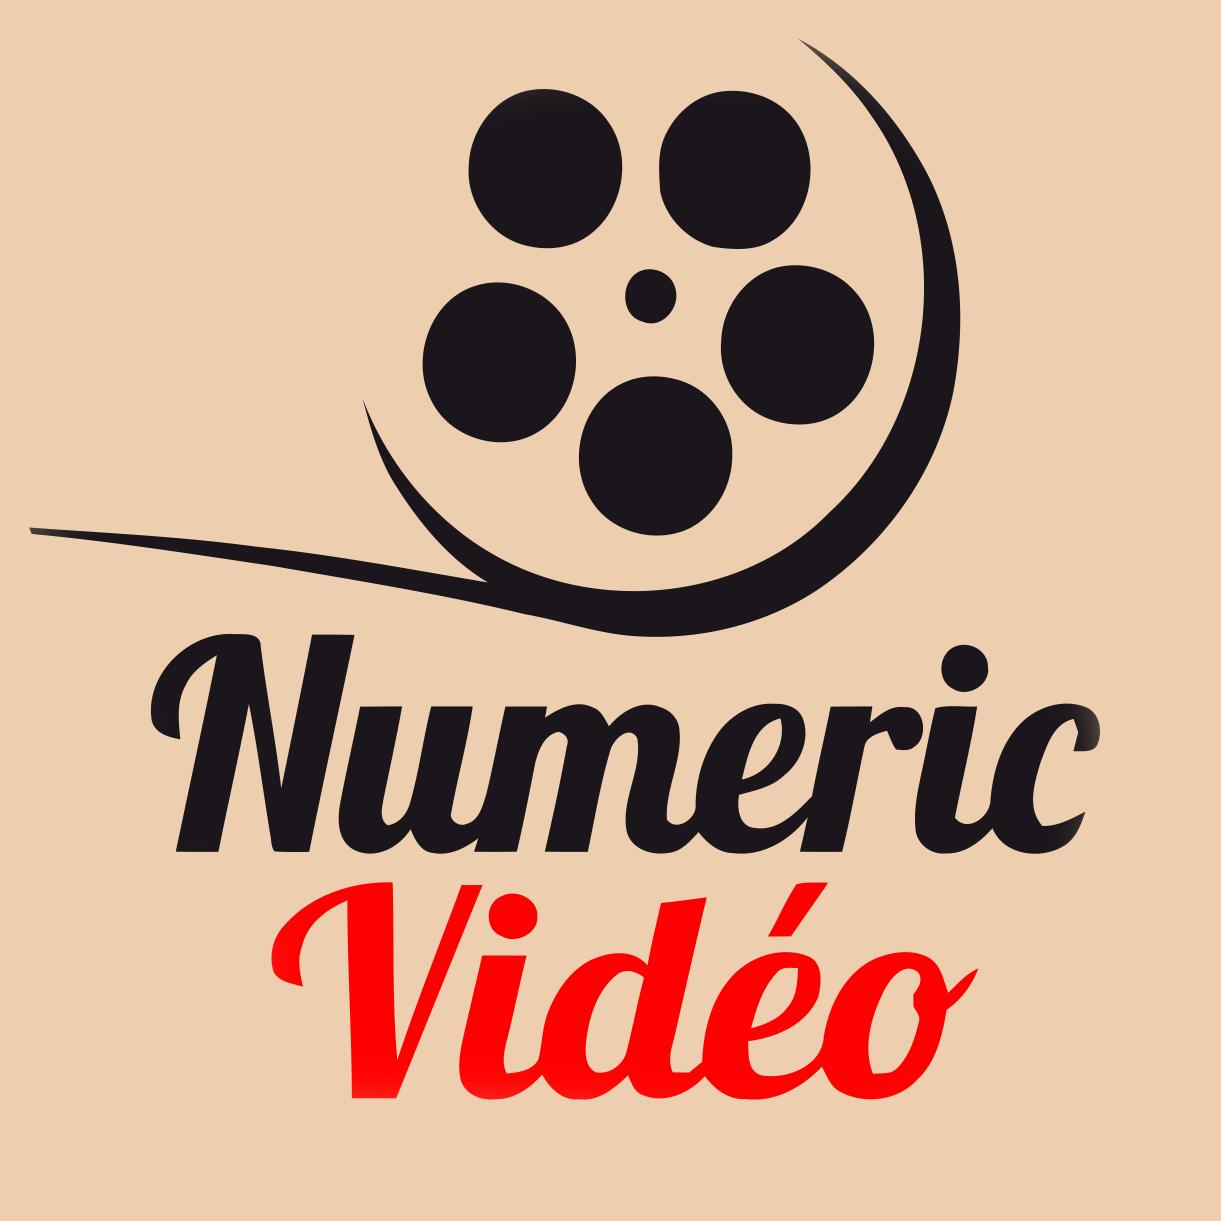 Numeric Vidéo